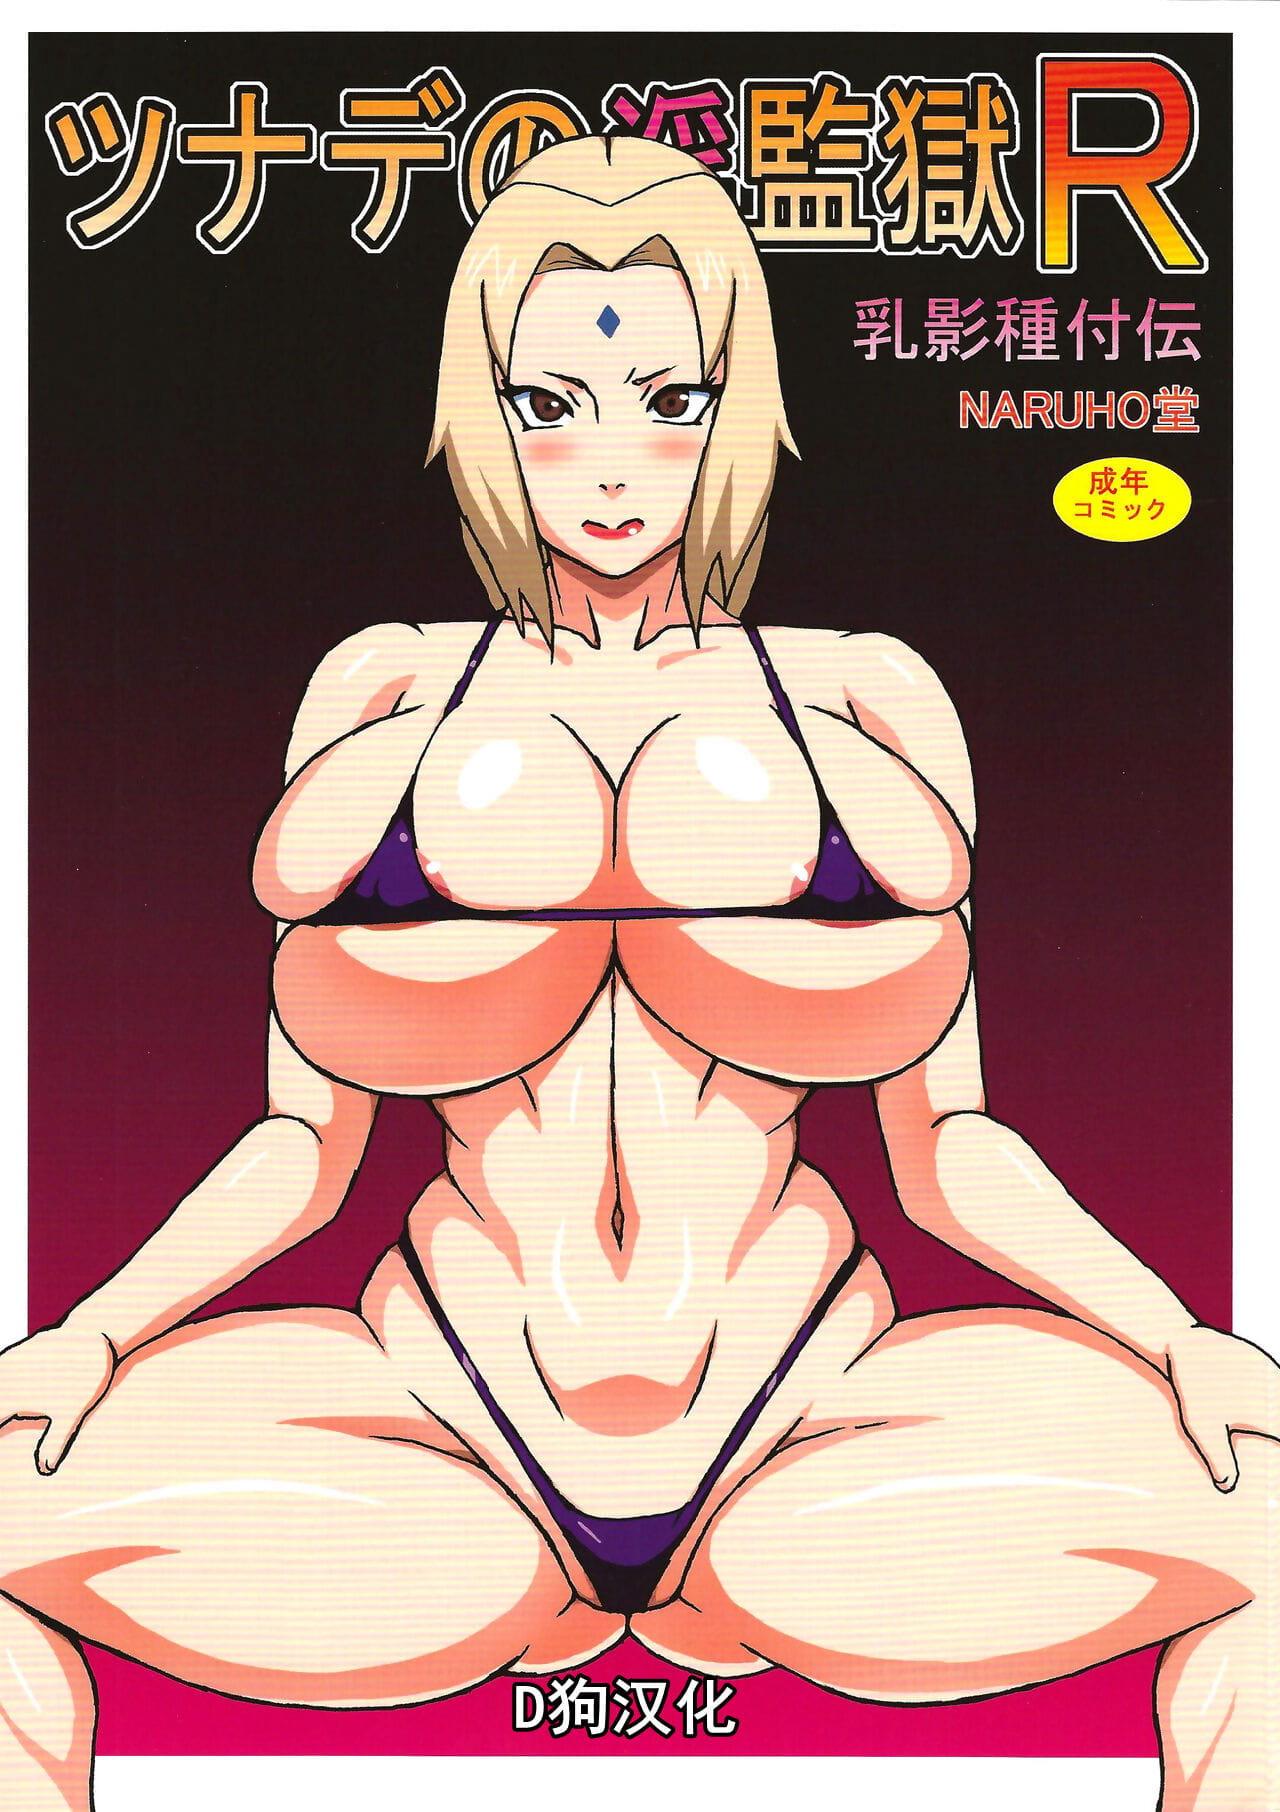 Naruho-dou Naruhodo Tsunade thimbleful Around Kangoku R Naruto Chinese D狗汉化 Digital